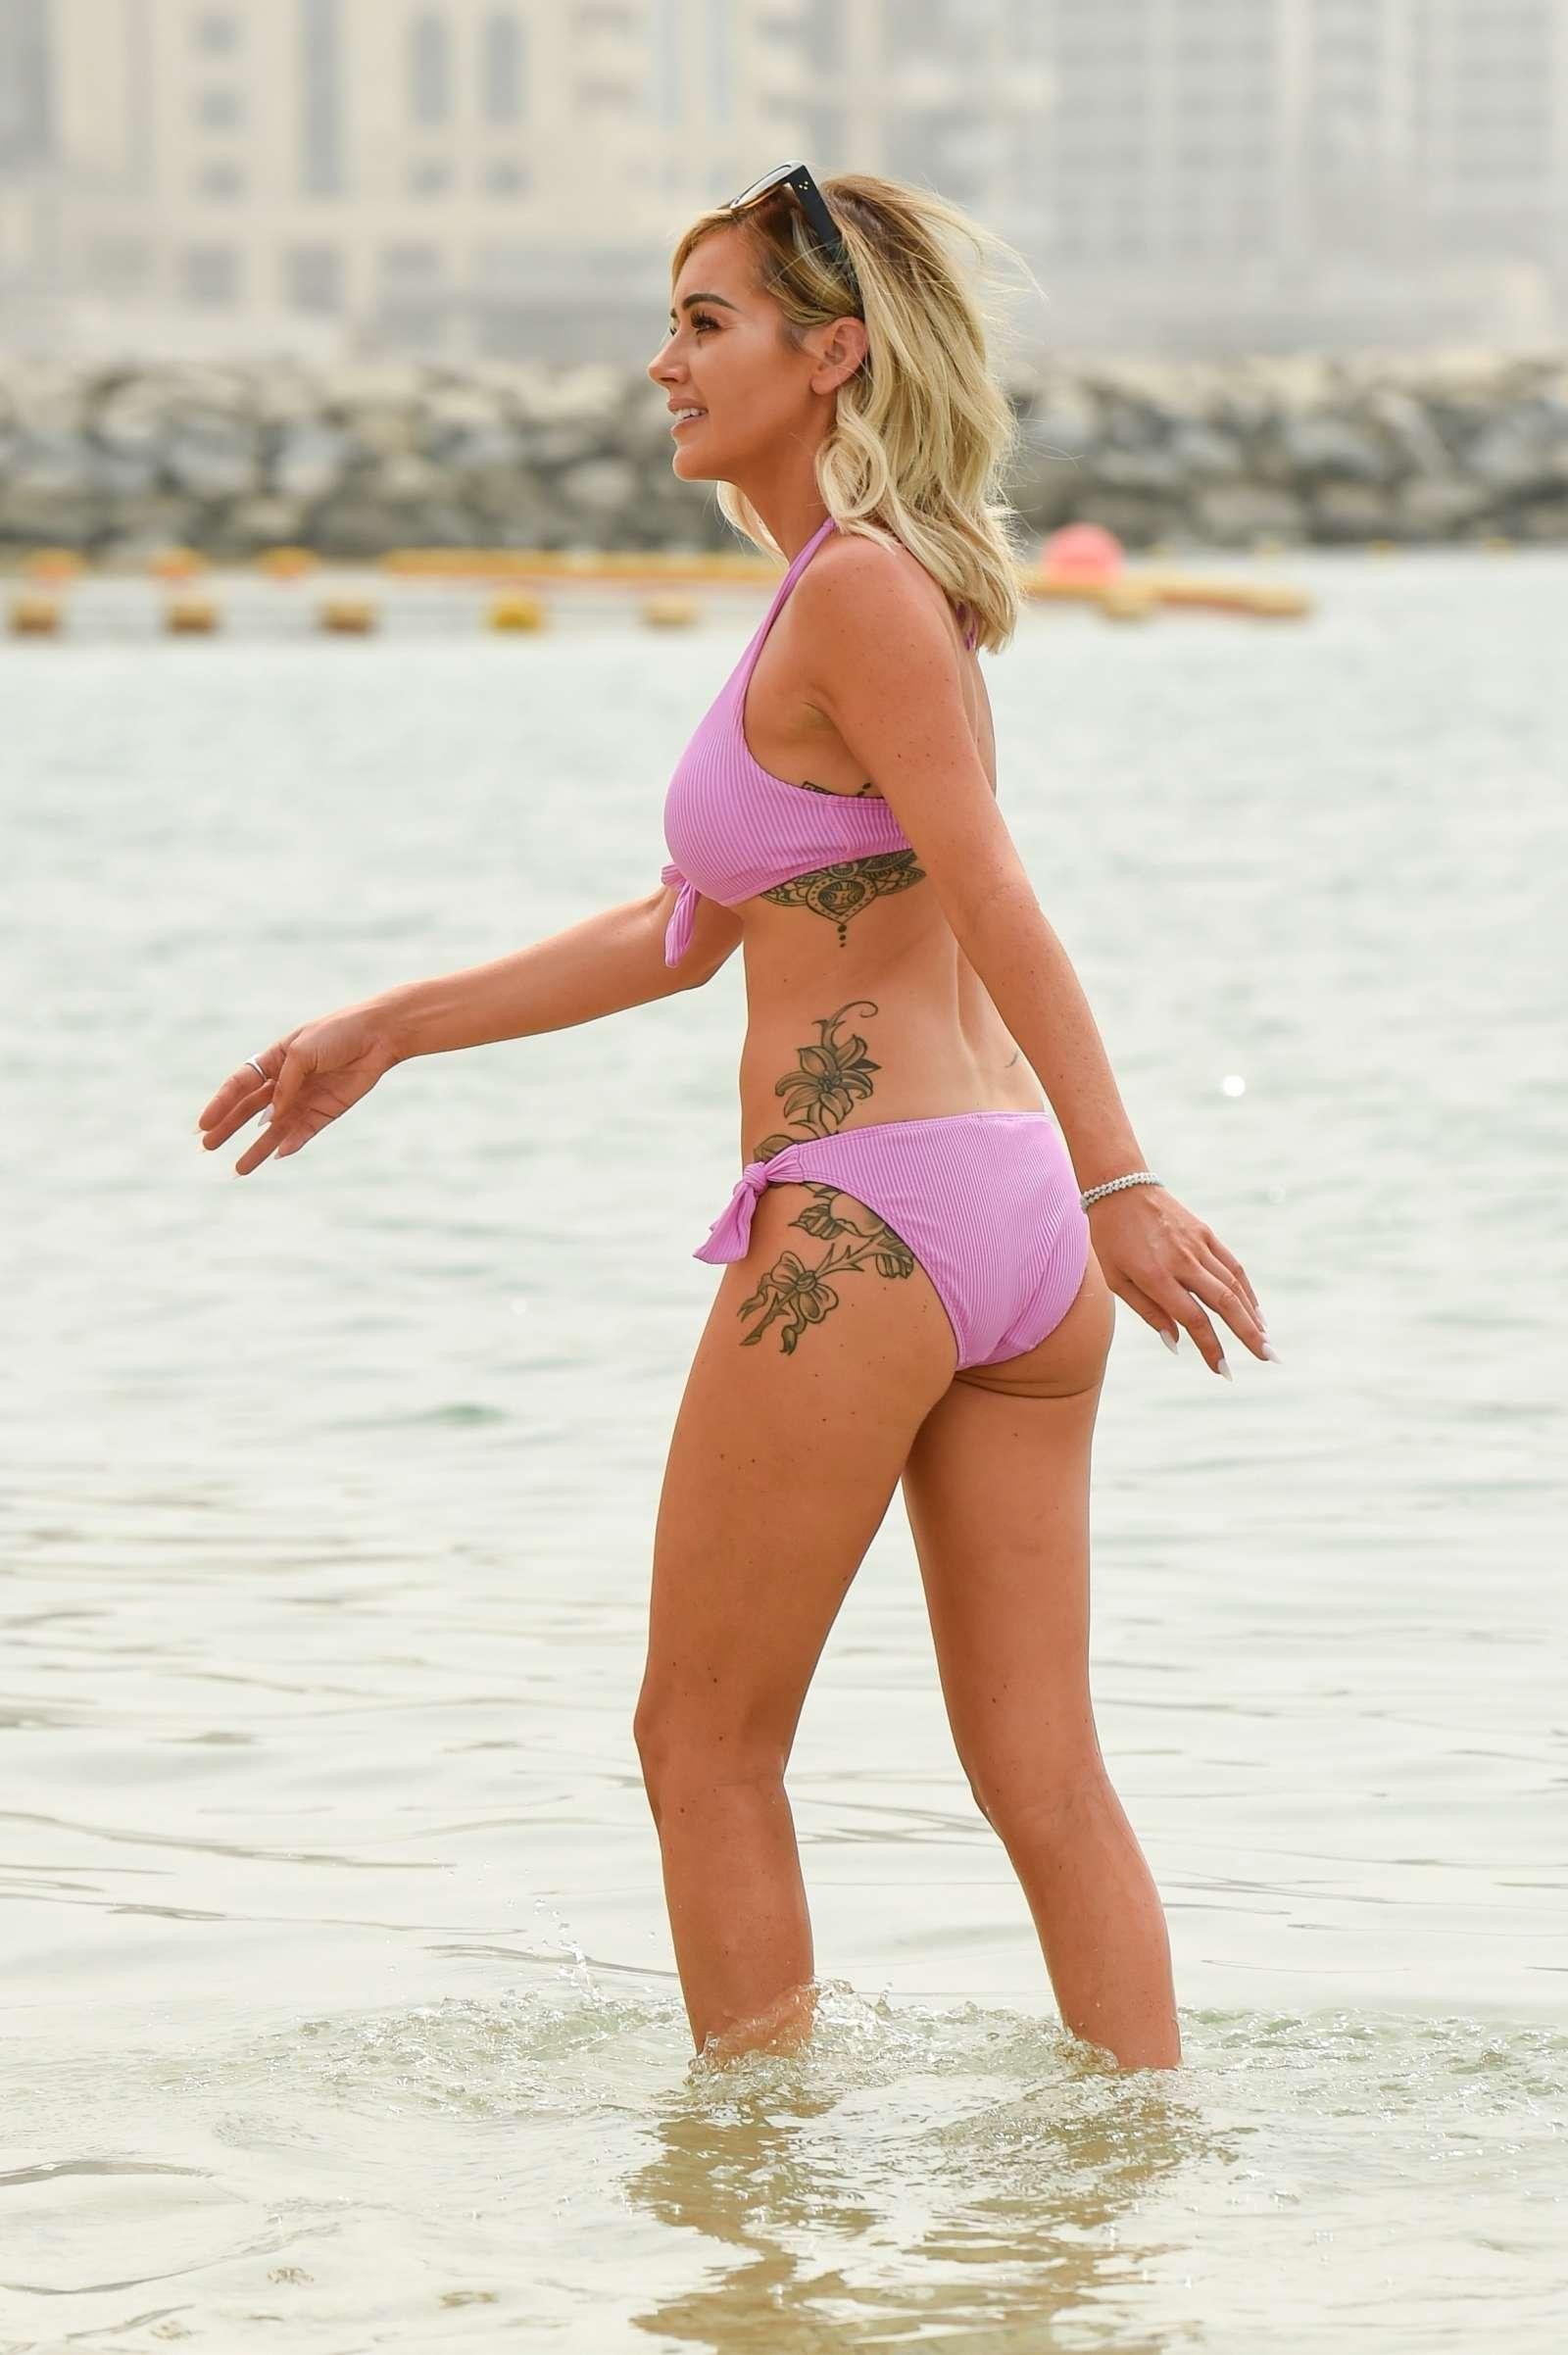 Bikini Laura Anderson nude (91 photos), Sexy, Bikini, Instagram, butt 2019